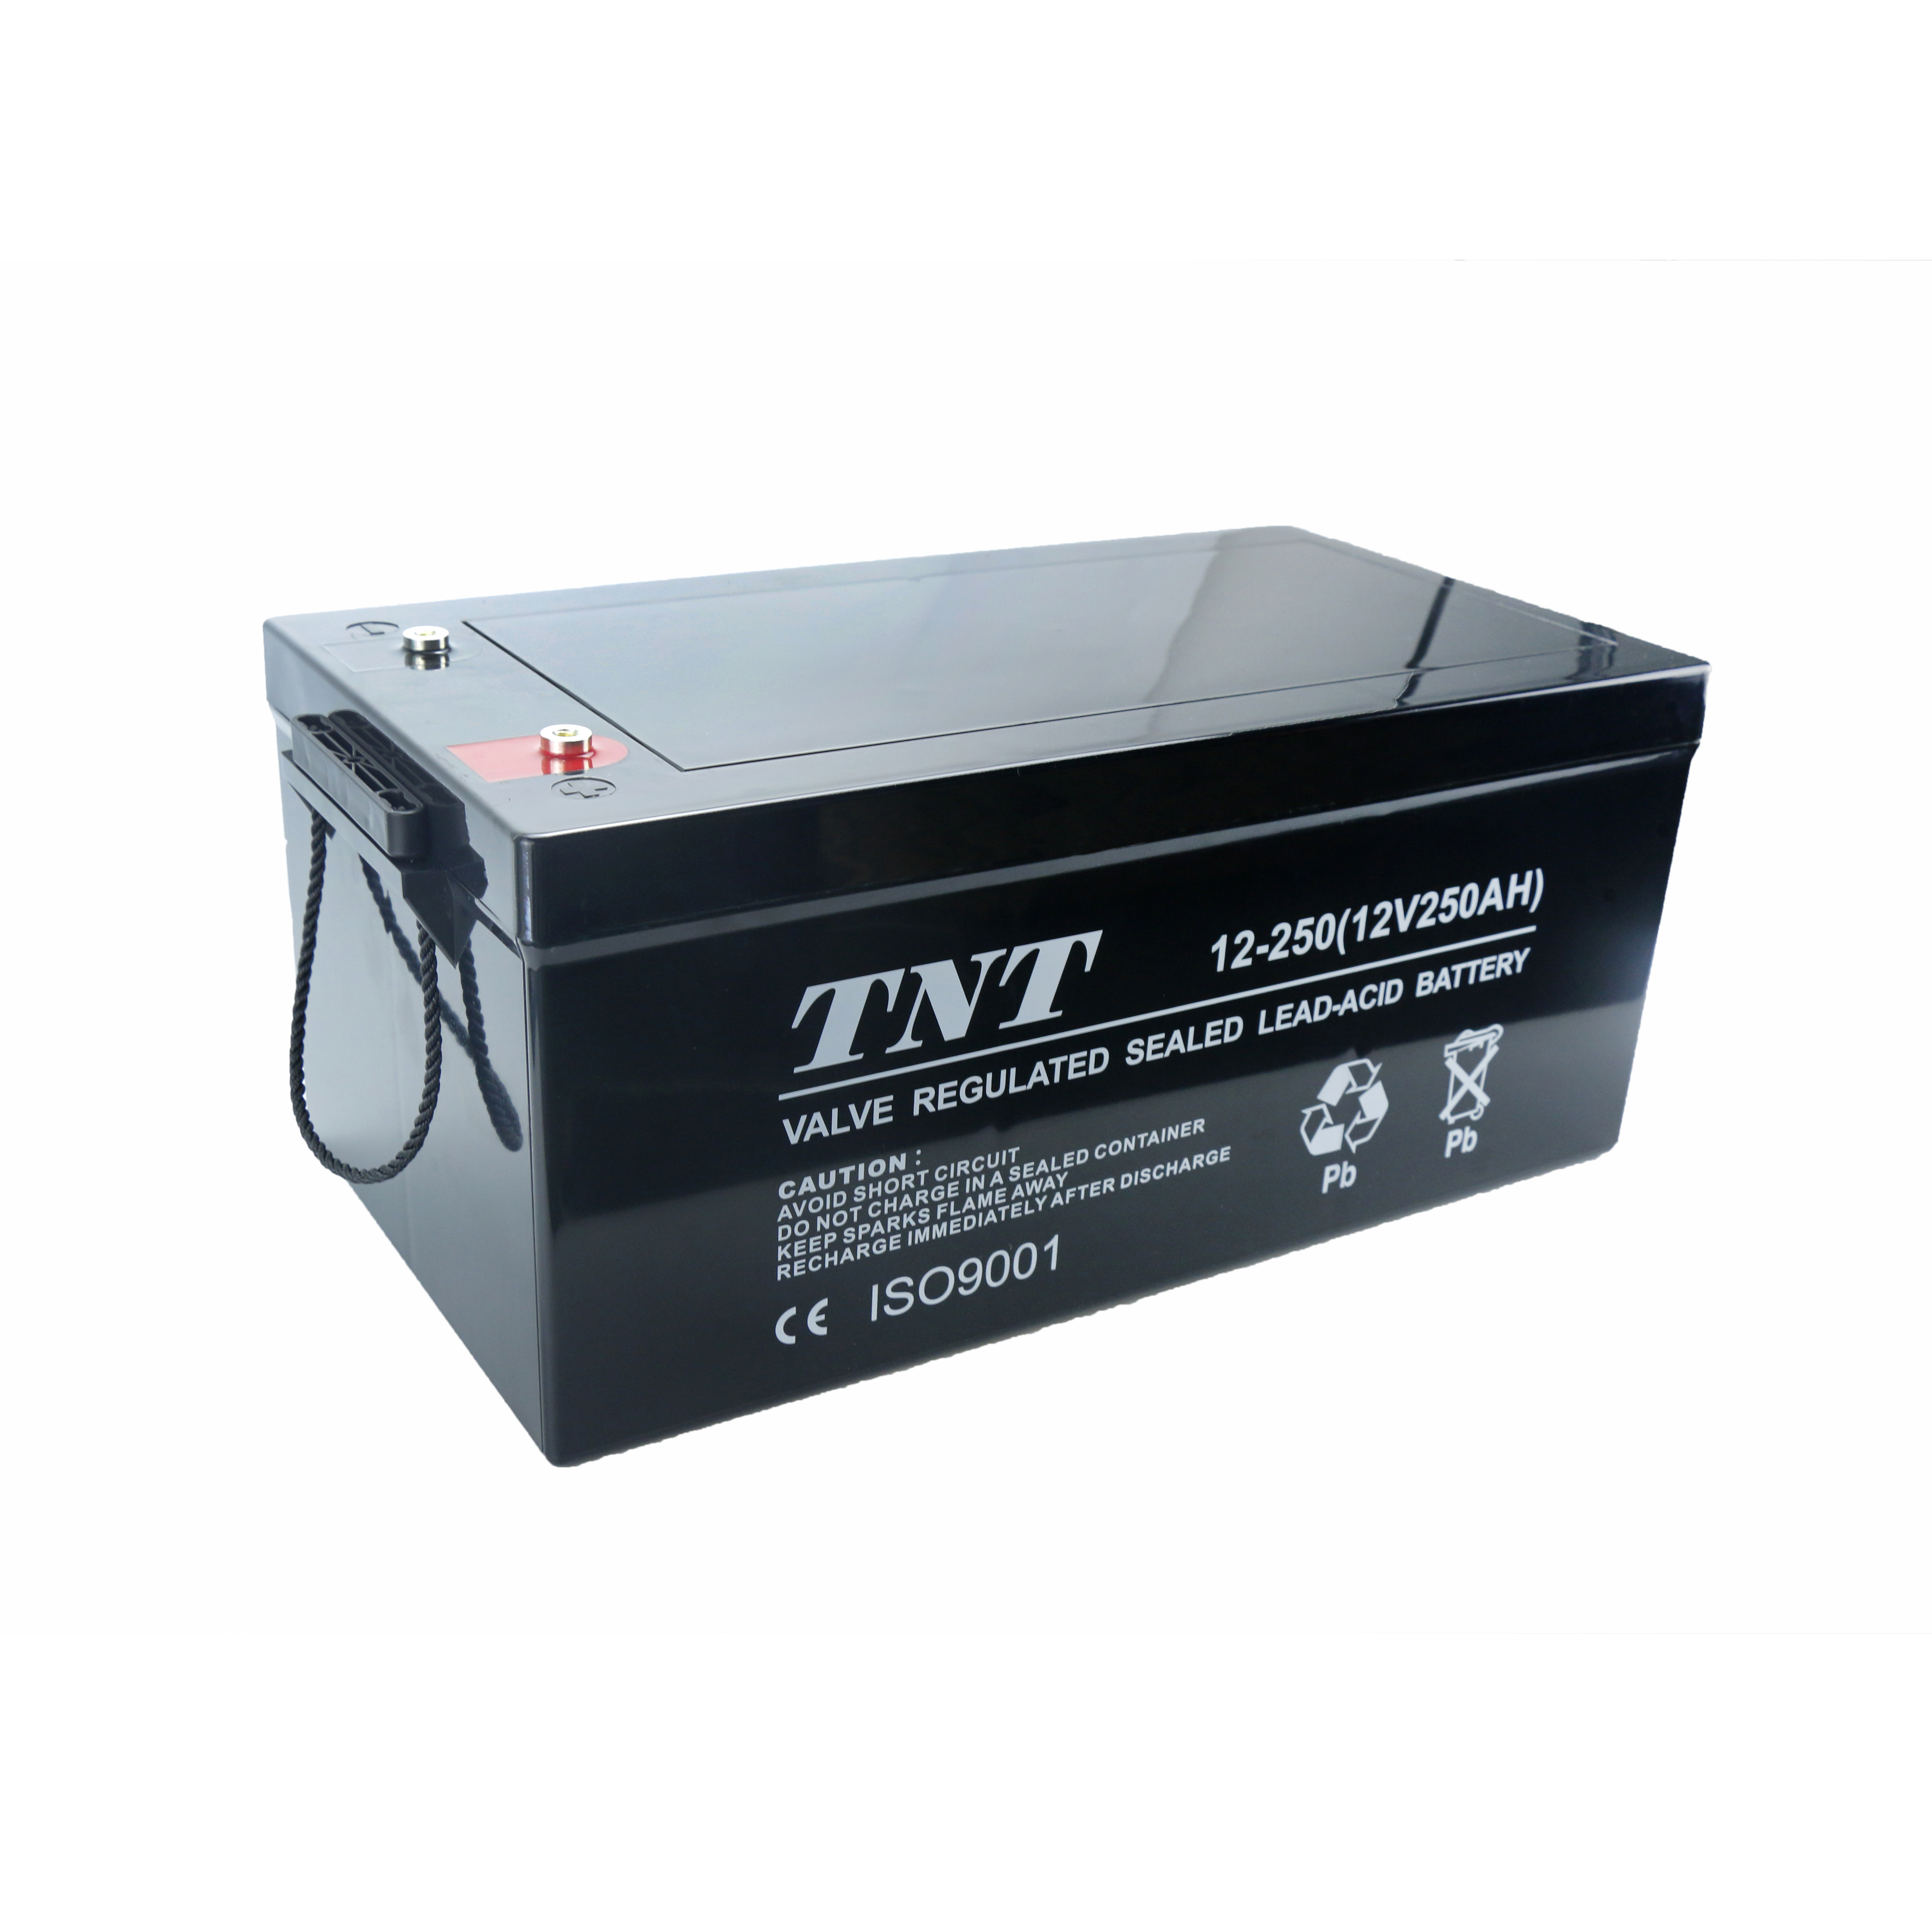 12v 250ah Solar Battery Ups Battery Storage Battery Deep Cycle Battery Rechargeable Gel Battery Vrla Battery